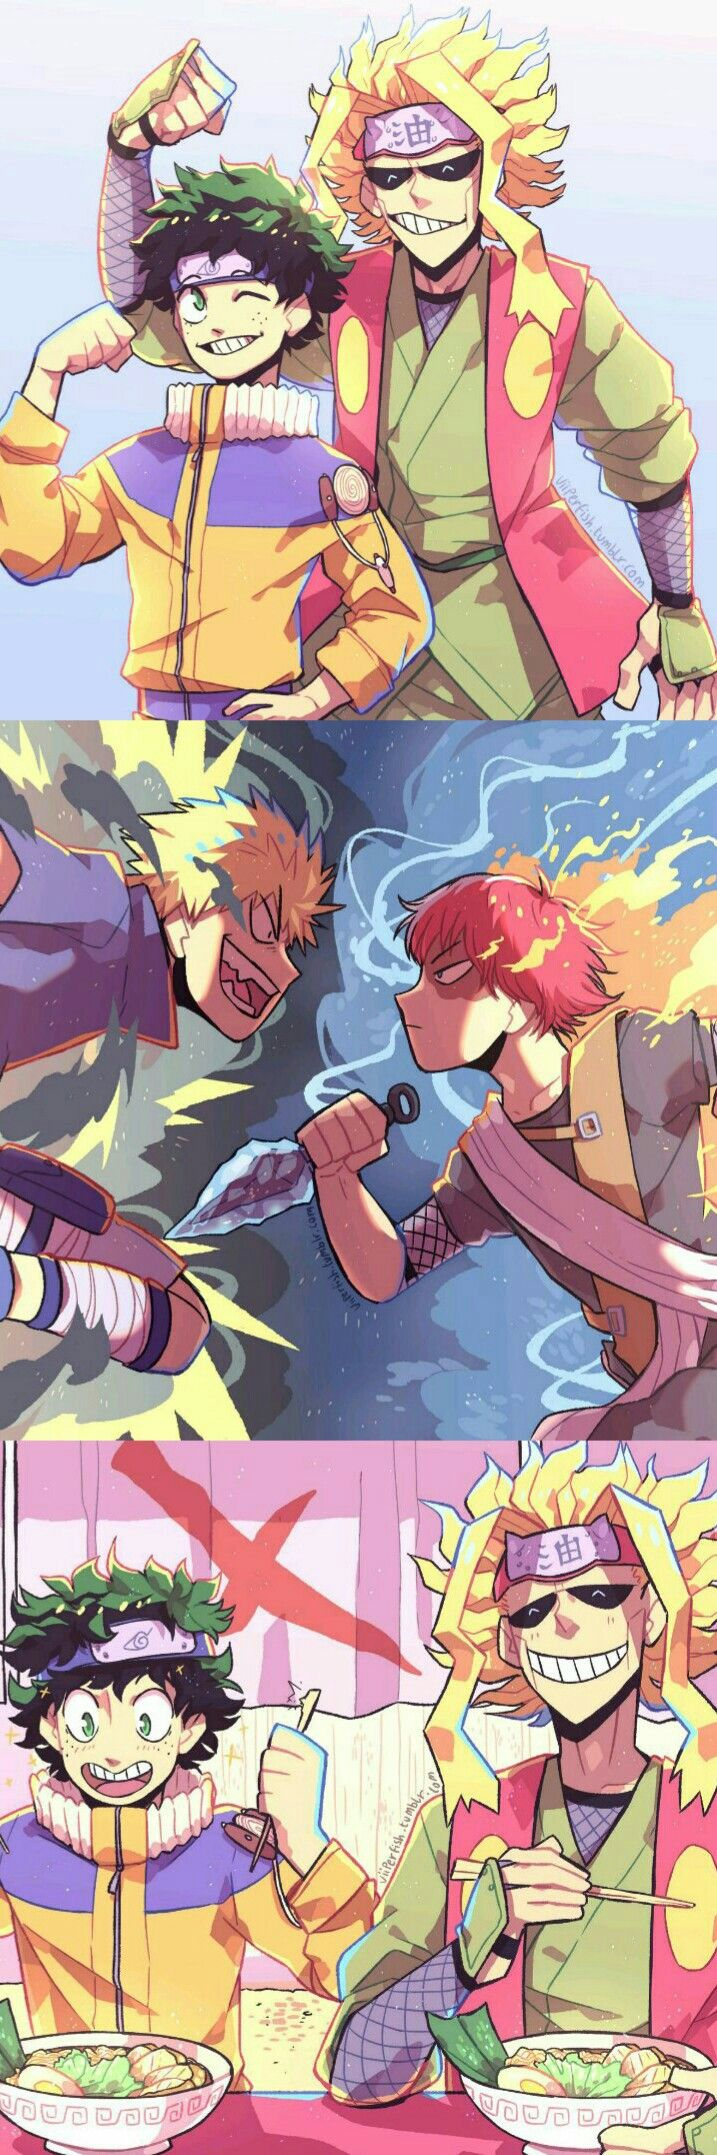 Cross-over! Naruto x Boku no Hero Academia, My Hero Academia #bnha #mha [Izuku Midoriya, All Might]